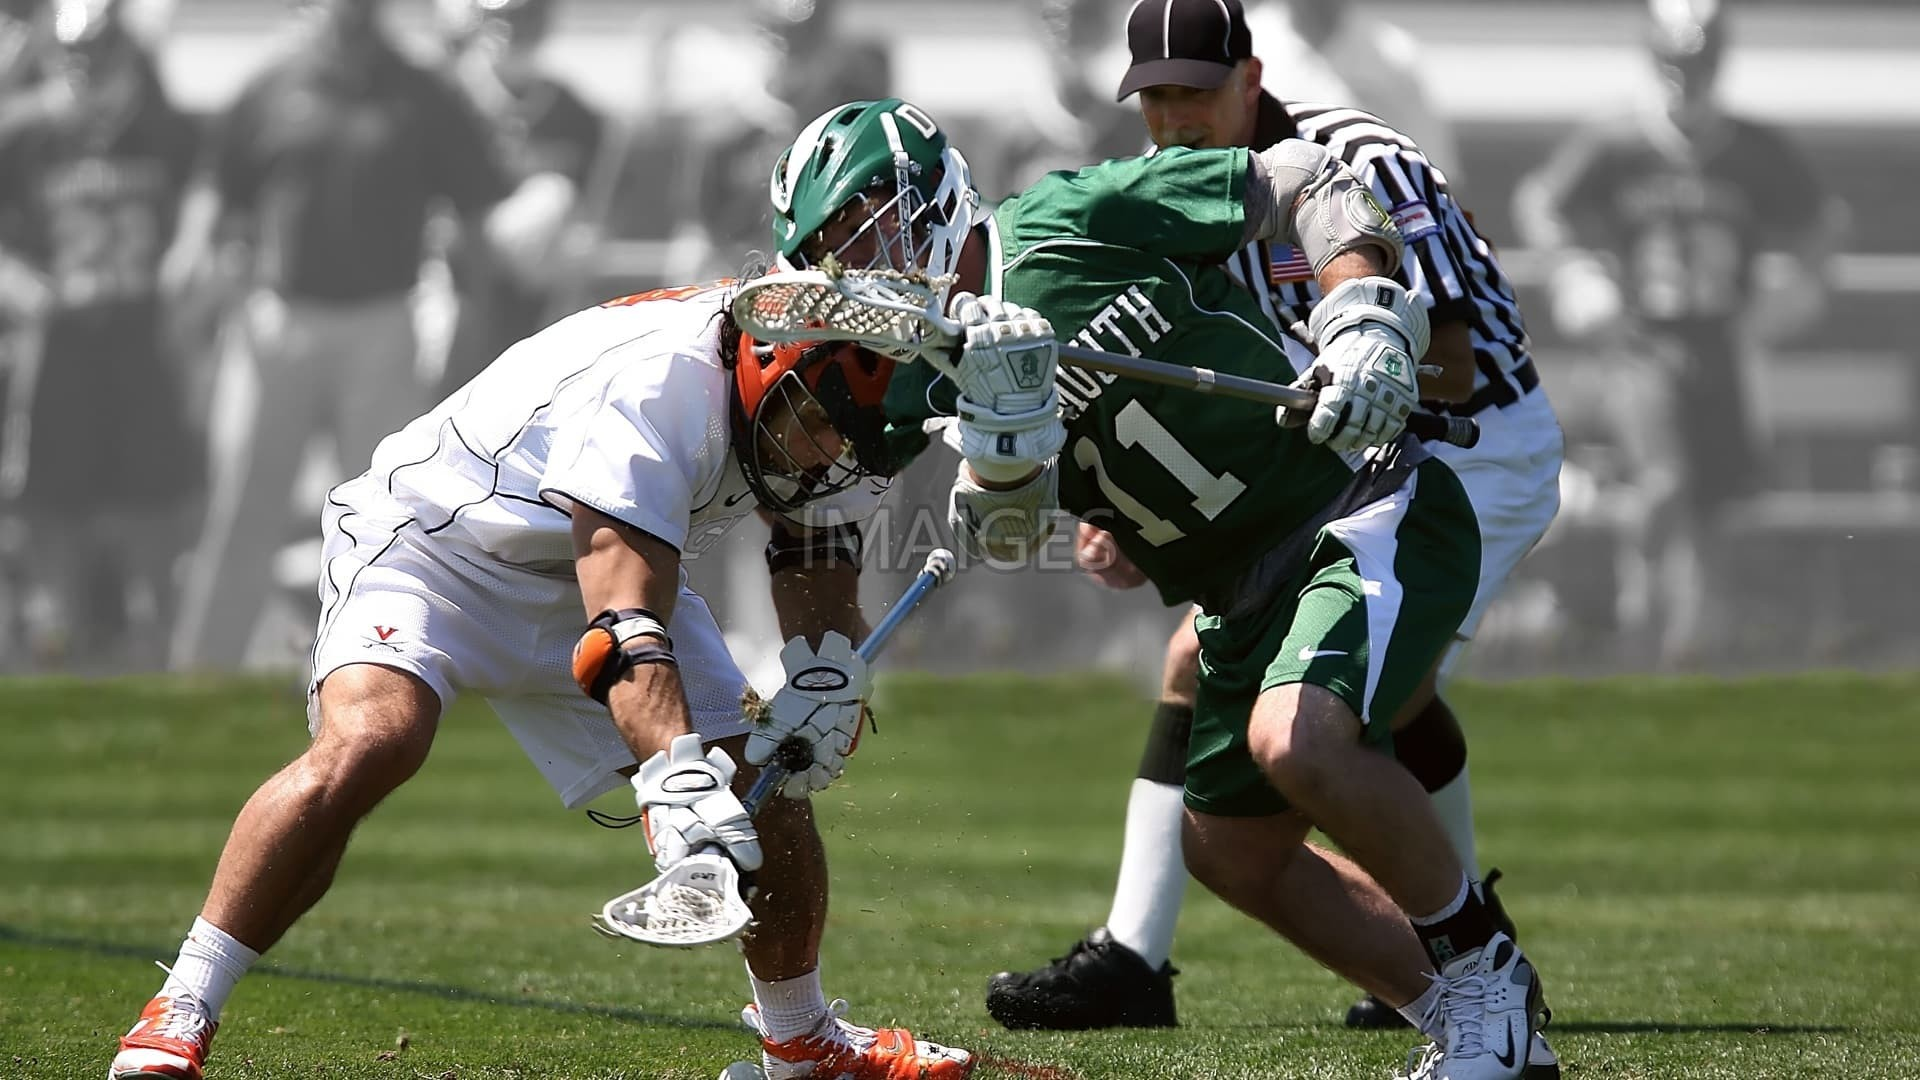 Lacrosse Wallpaper Hd: Lacrosse Wallpaper (53+ Images